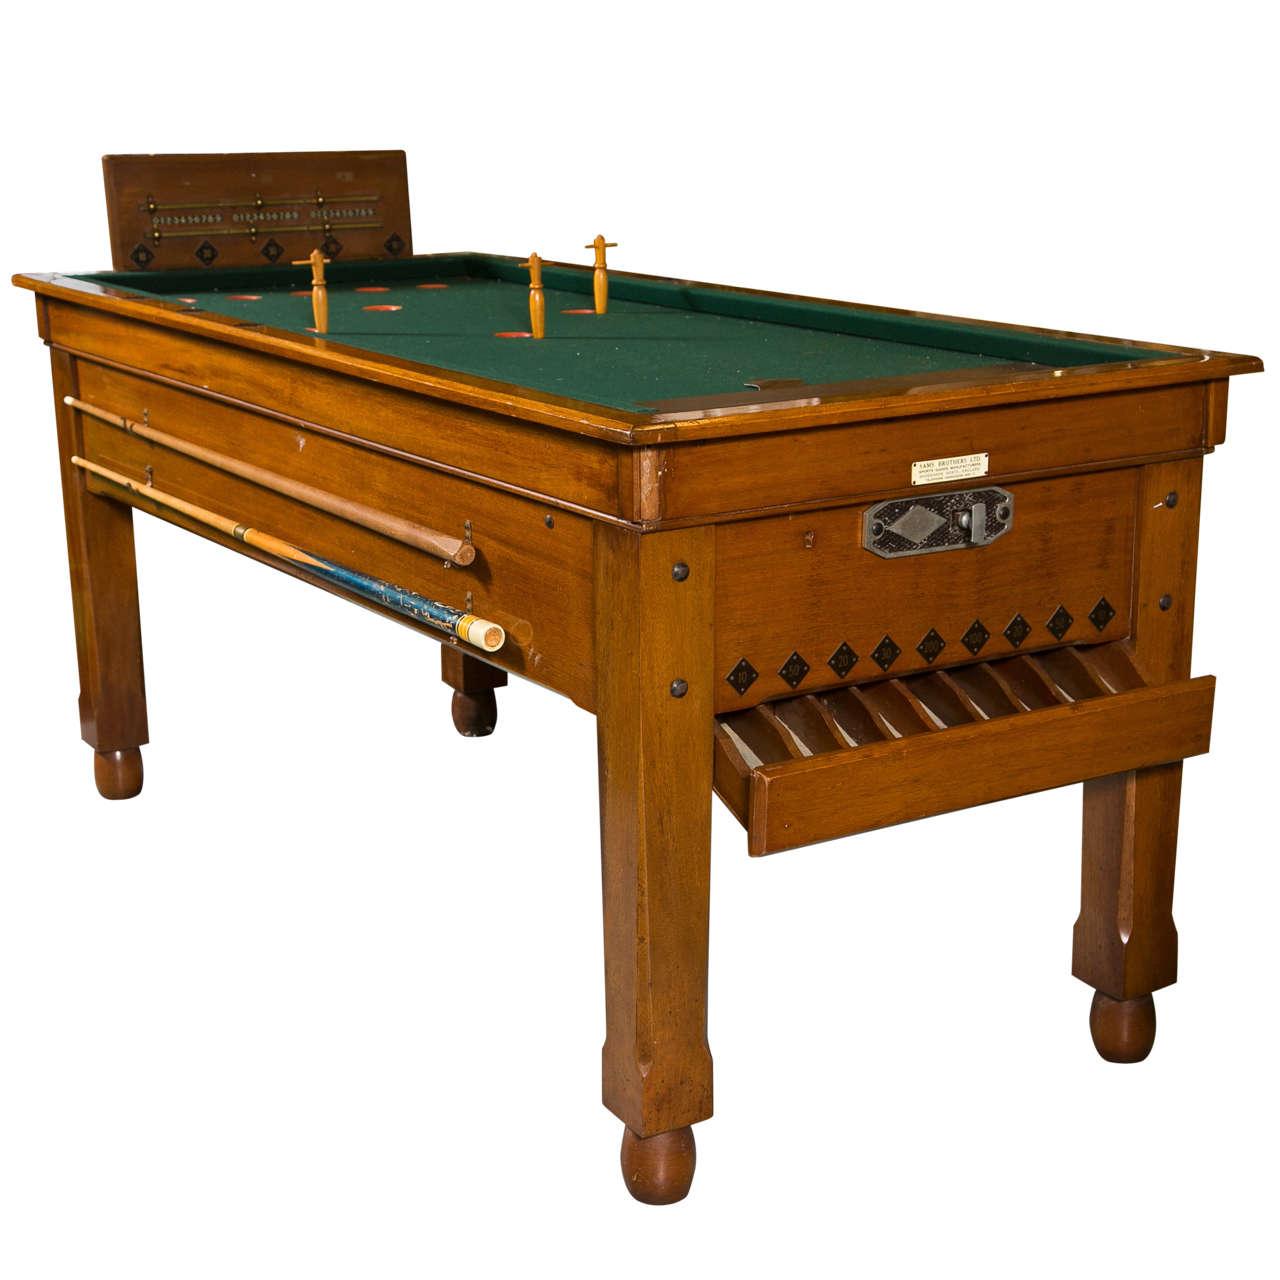 Antuqe english bar billiards table at 1stdibs for England table